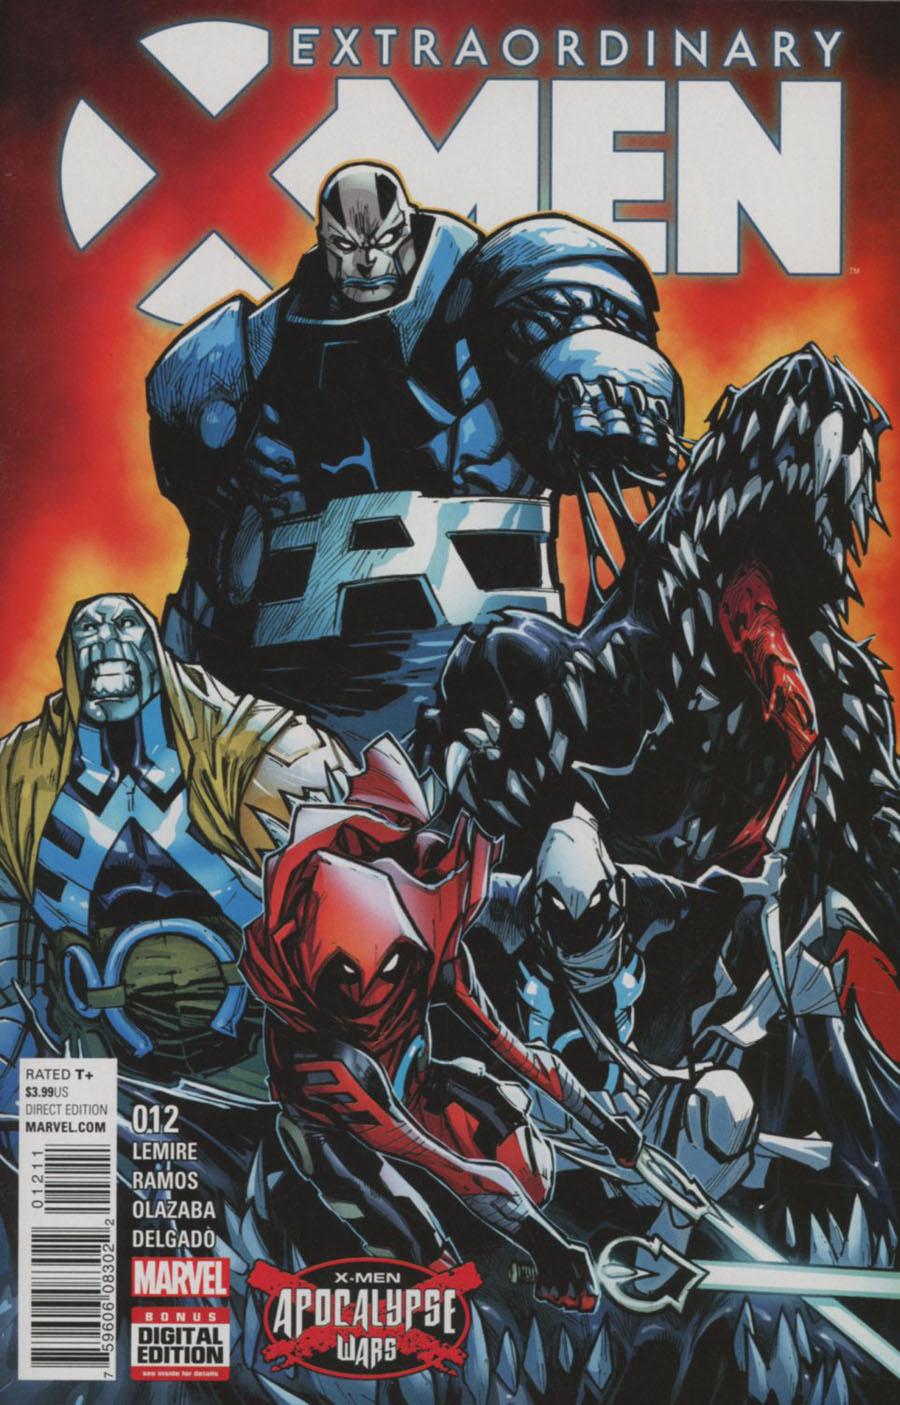 Extraordinary X-Men #12 Cover A Regular Humberto Ramos Cover (X-Men Apocalypse Wars Tie-In)